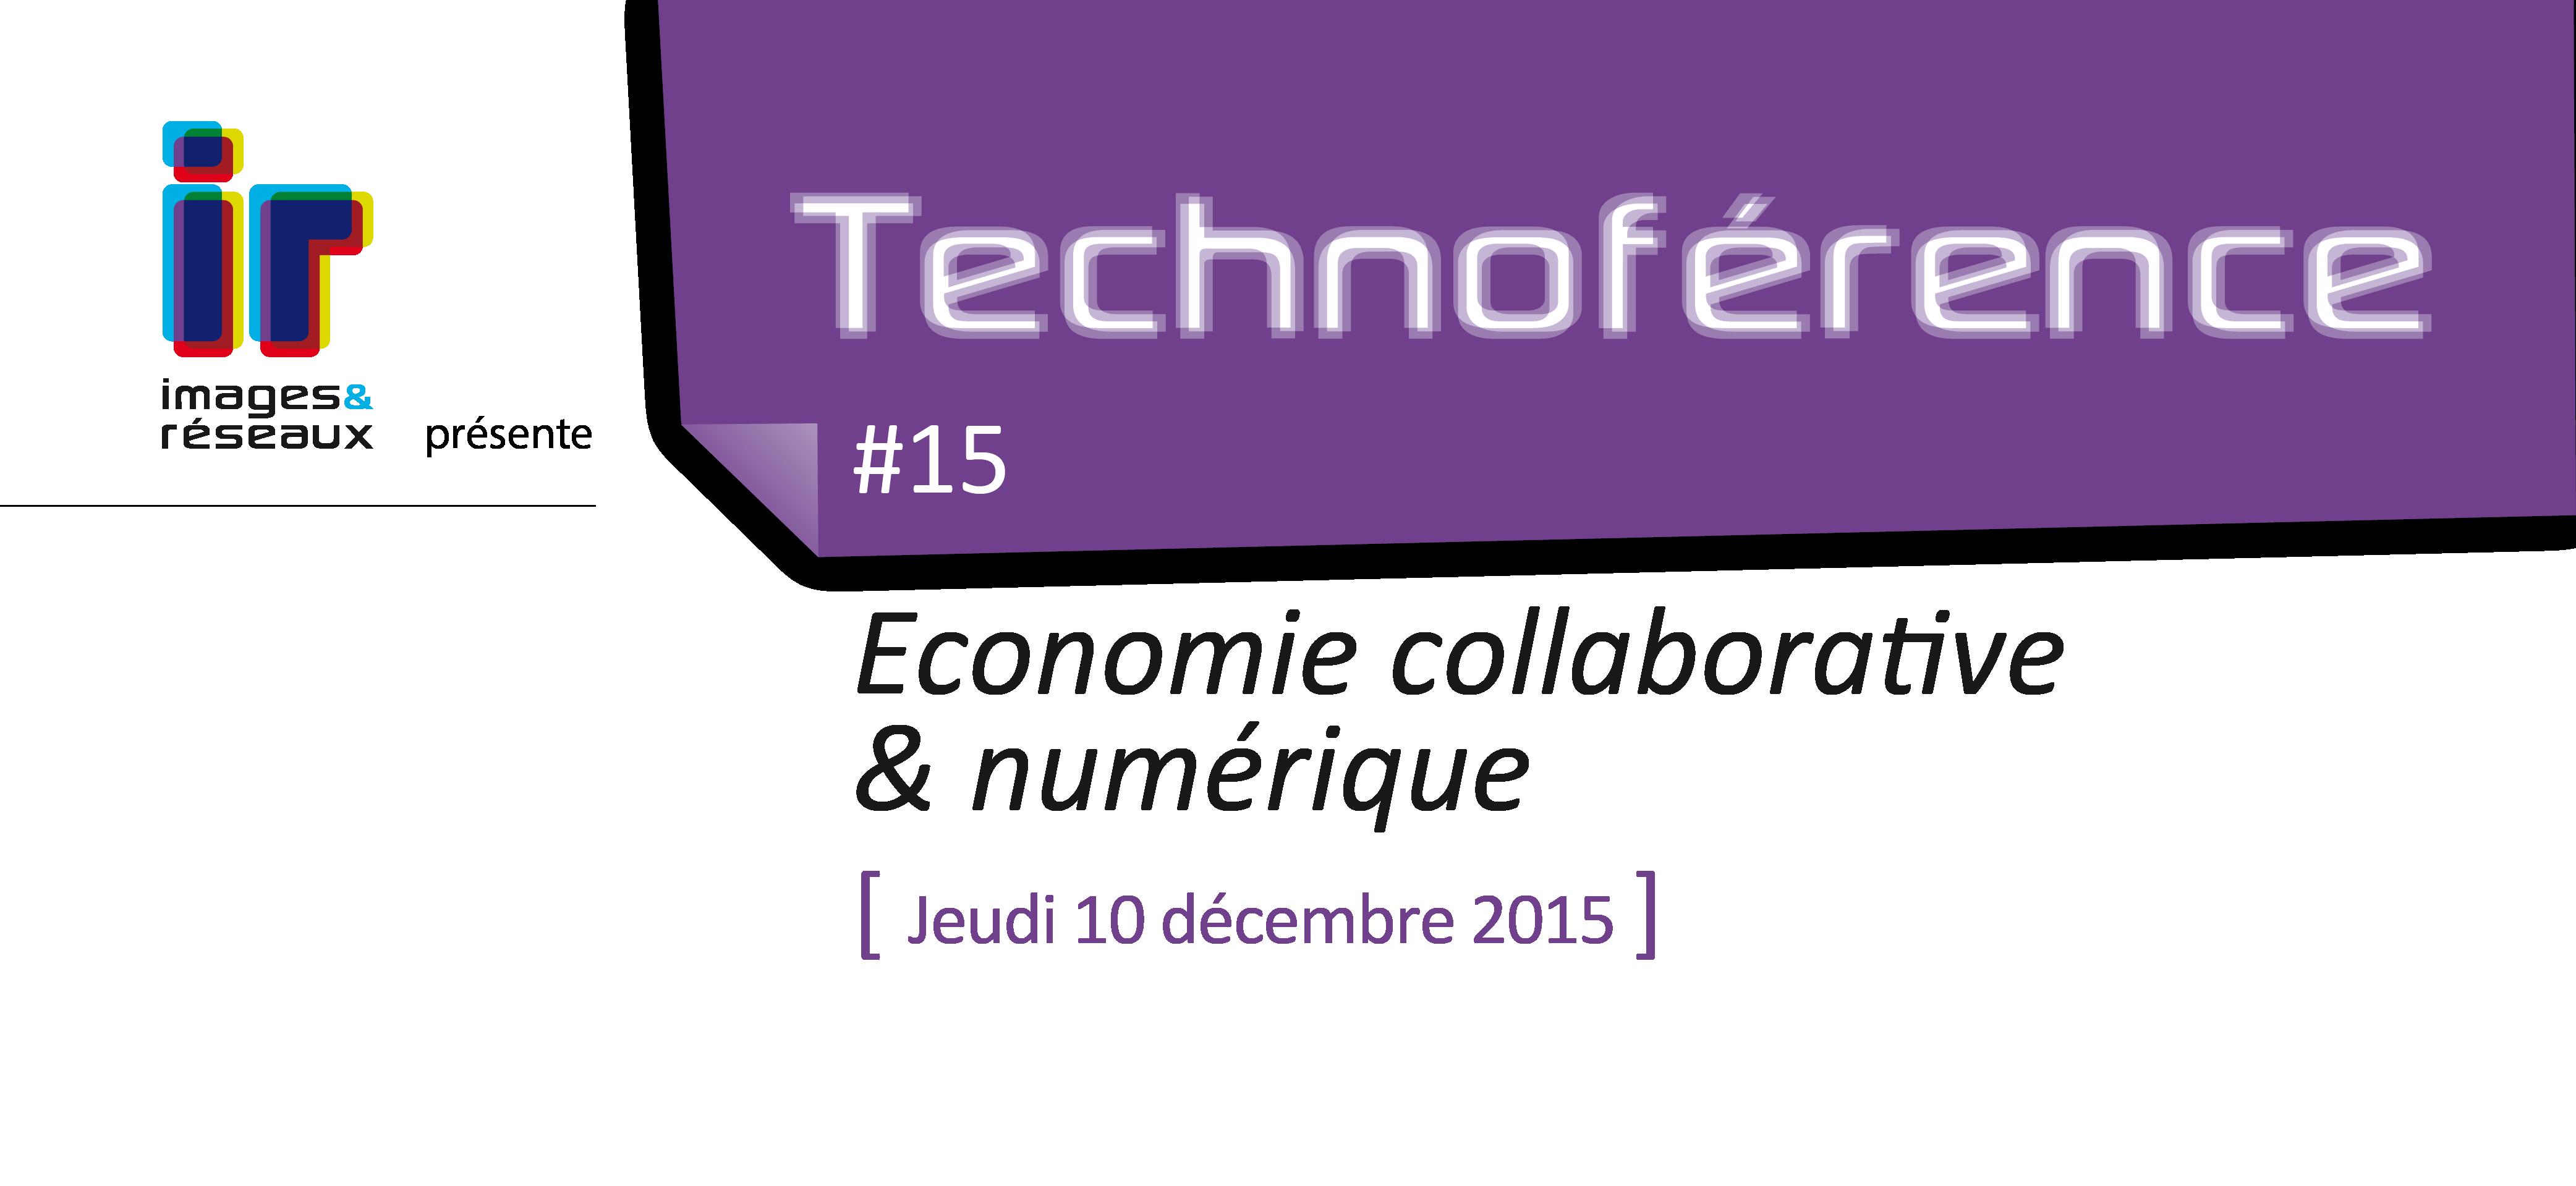 Technoference15